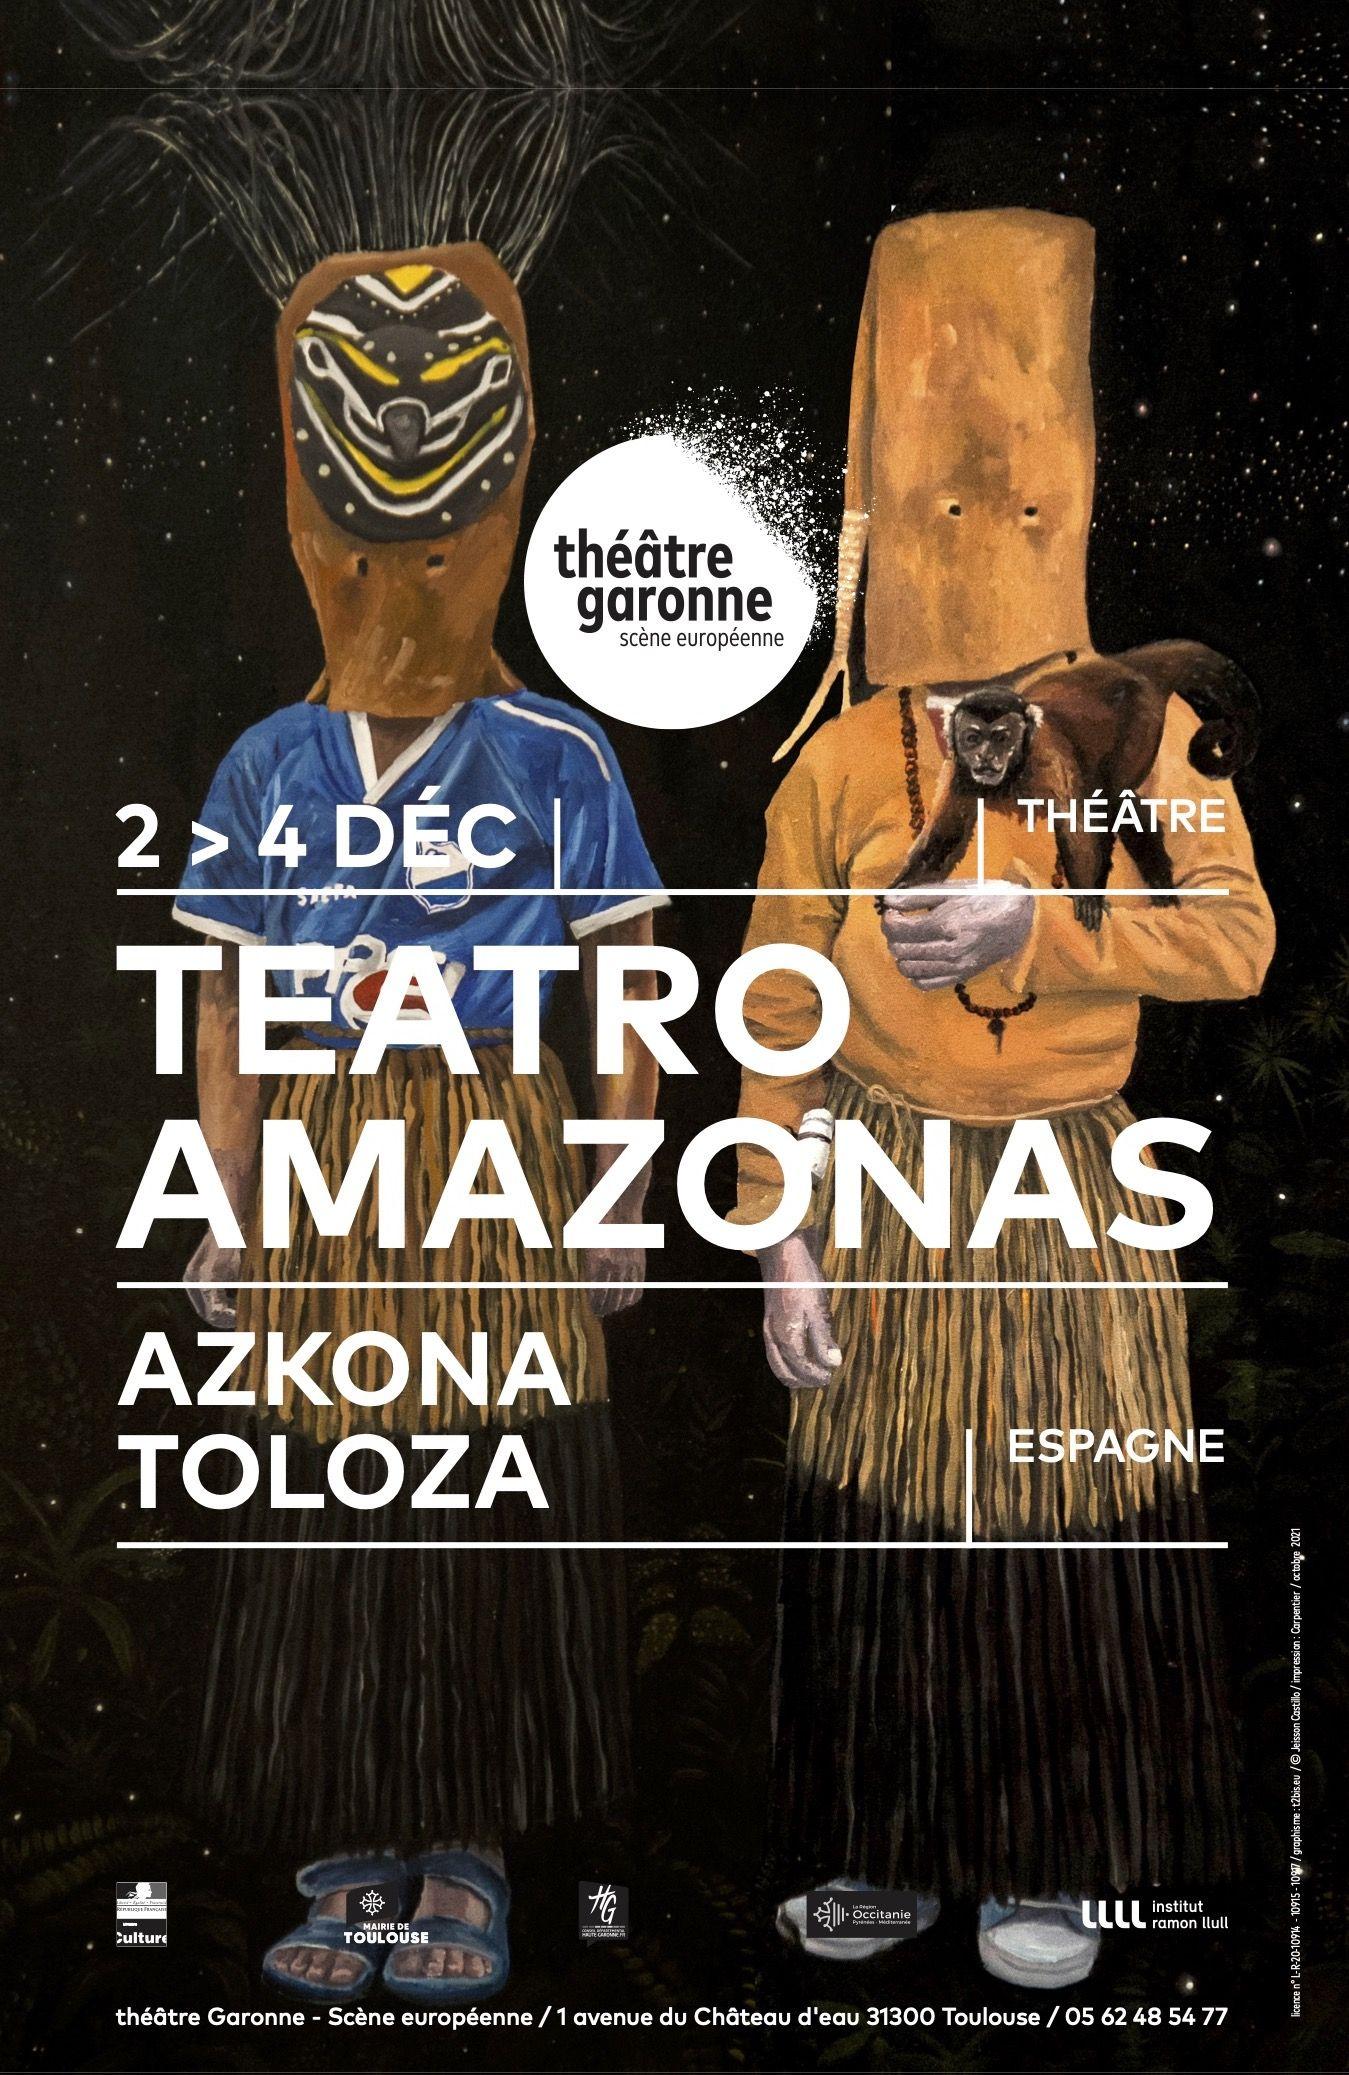 Théâtre Garonne - Teatro Amazonas